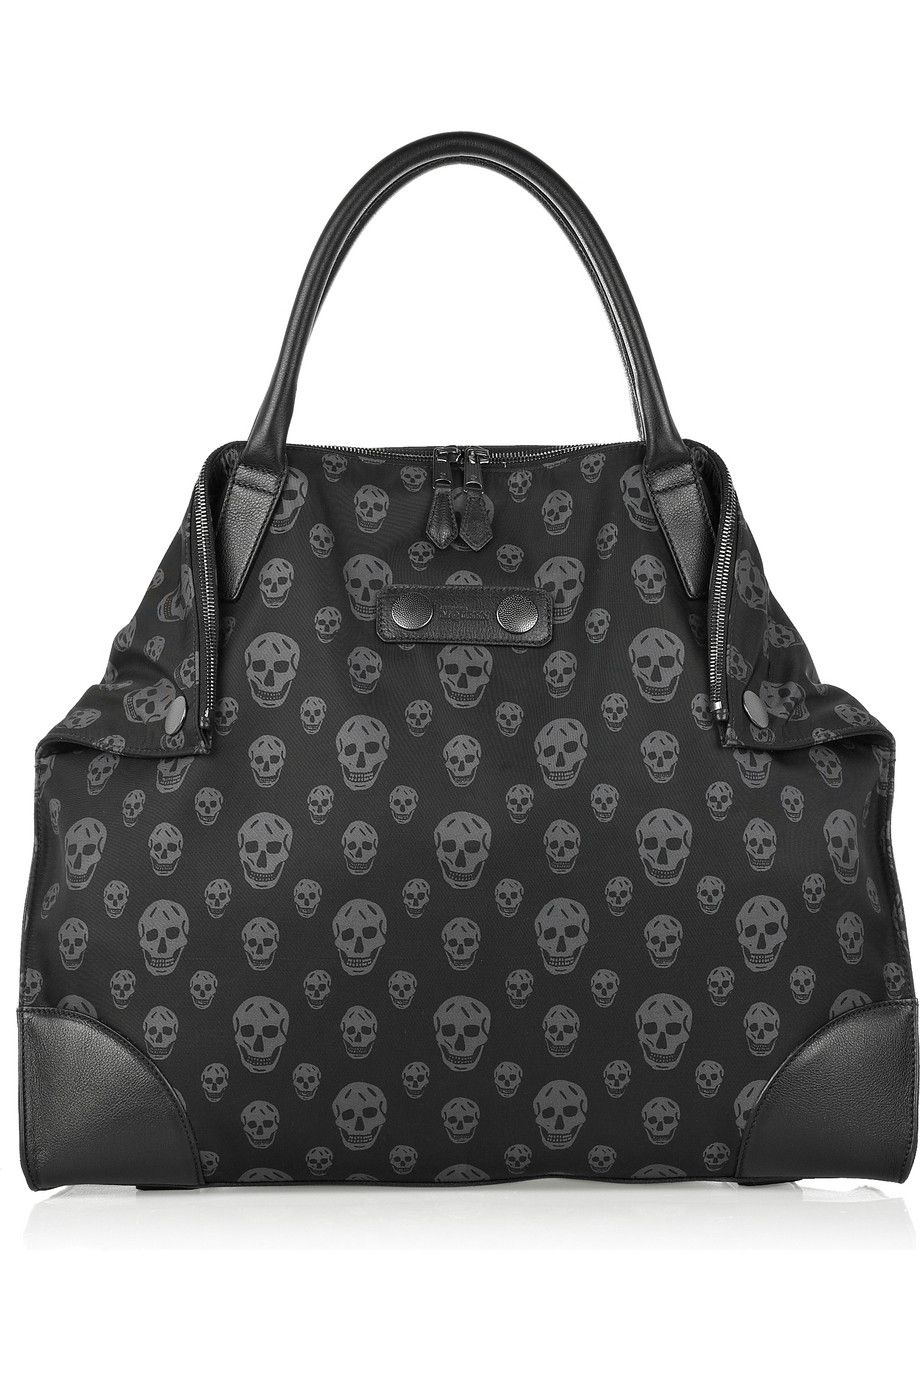 6824e02f504 Alexander McQueen skull tote - *Every Creepy Fashionista needs a ...